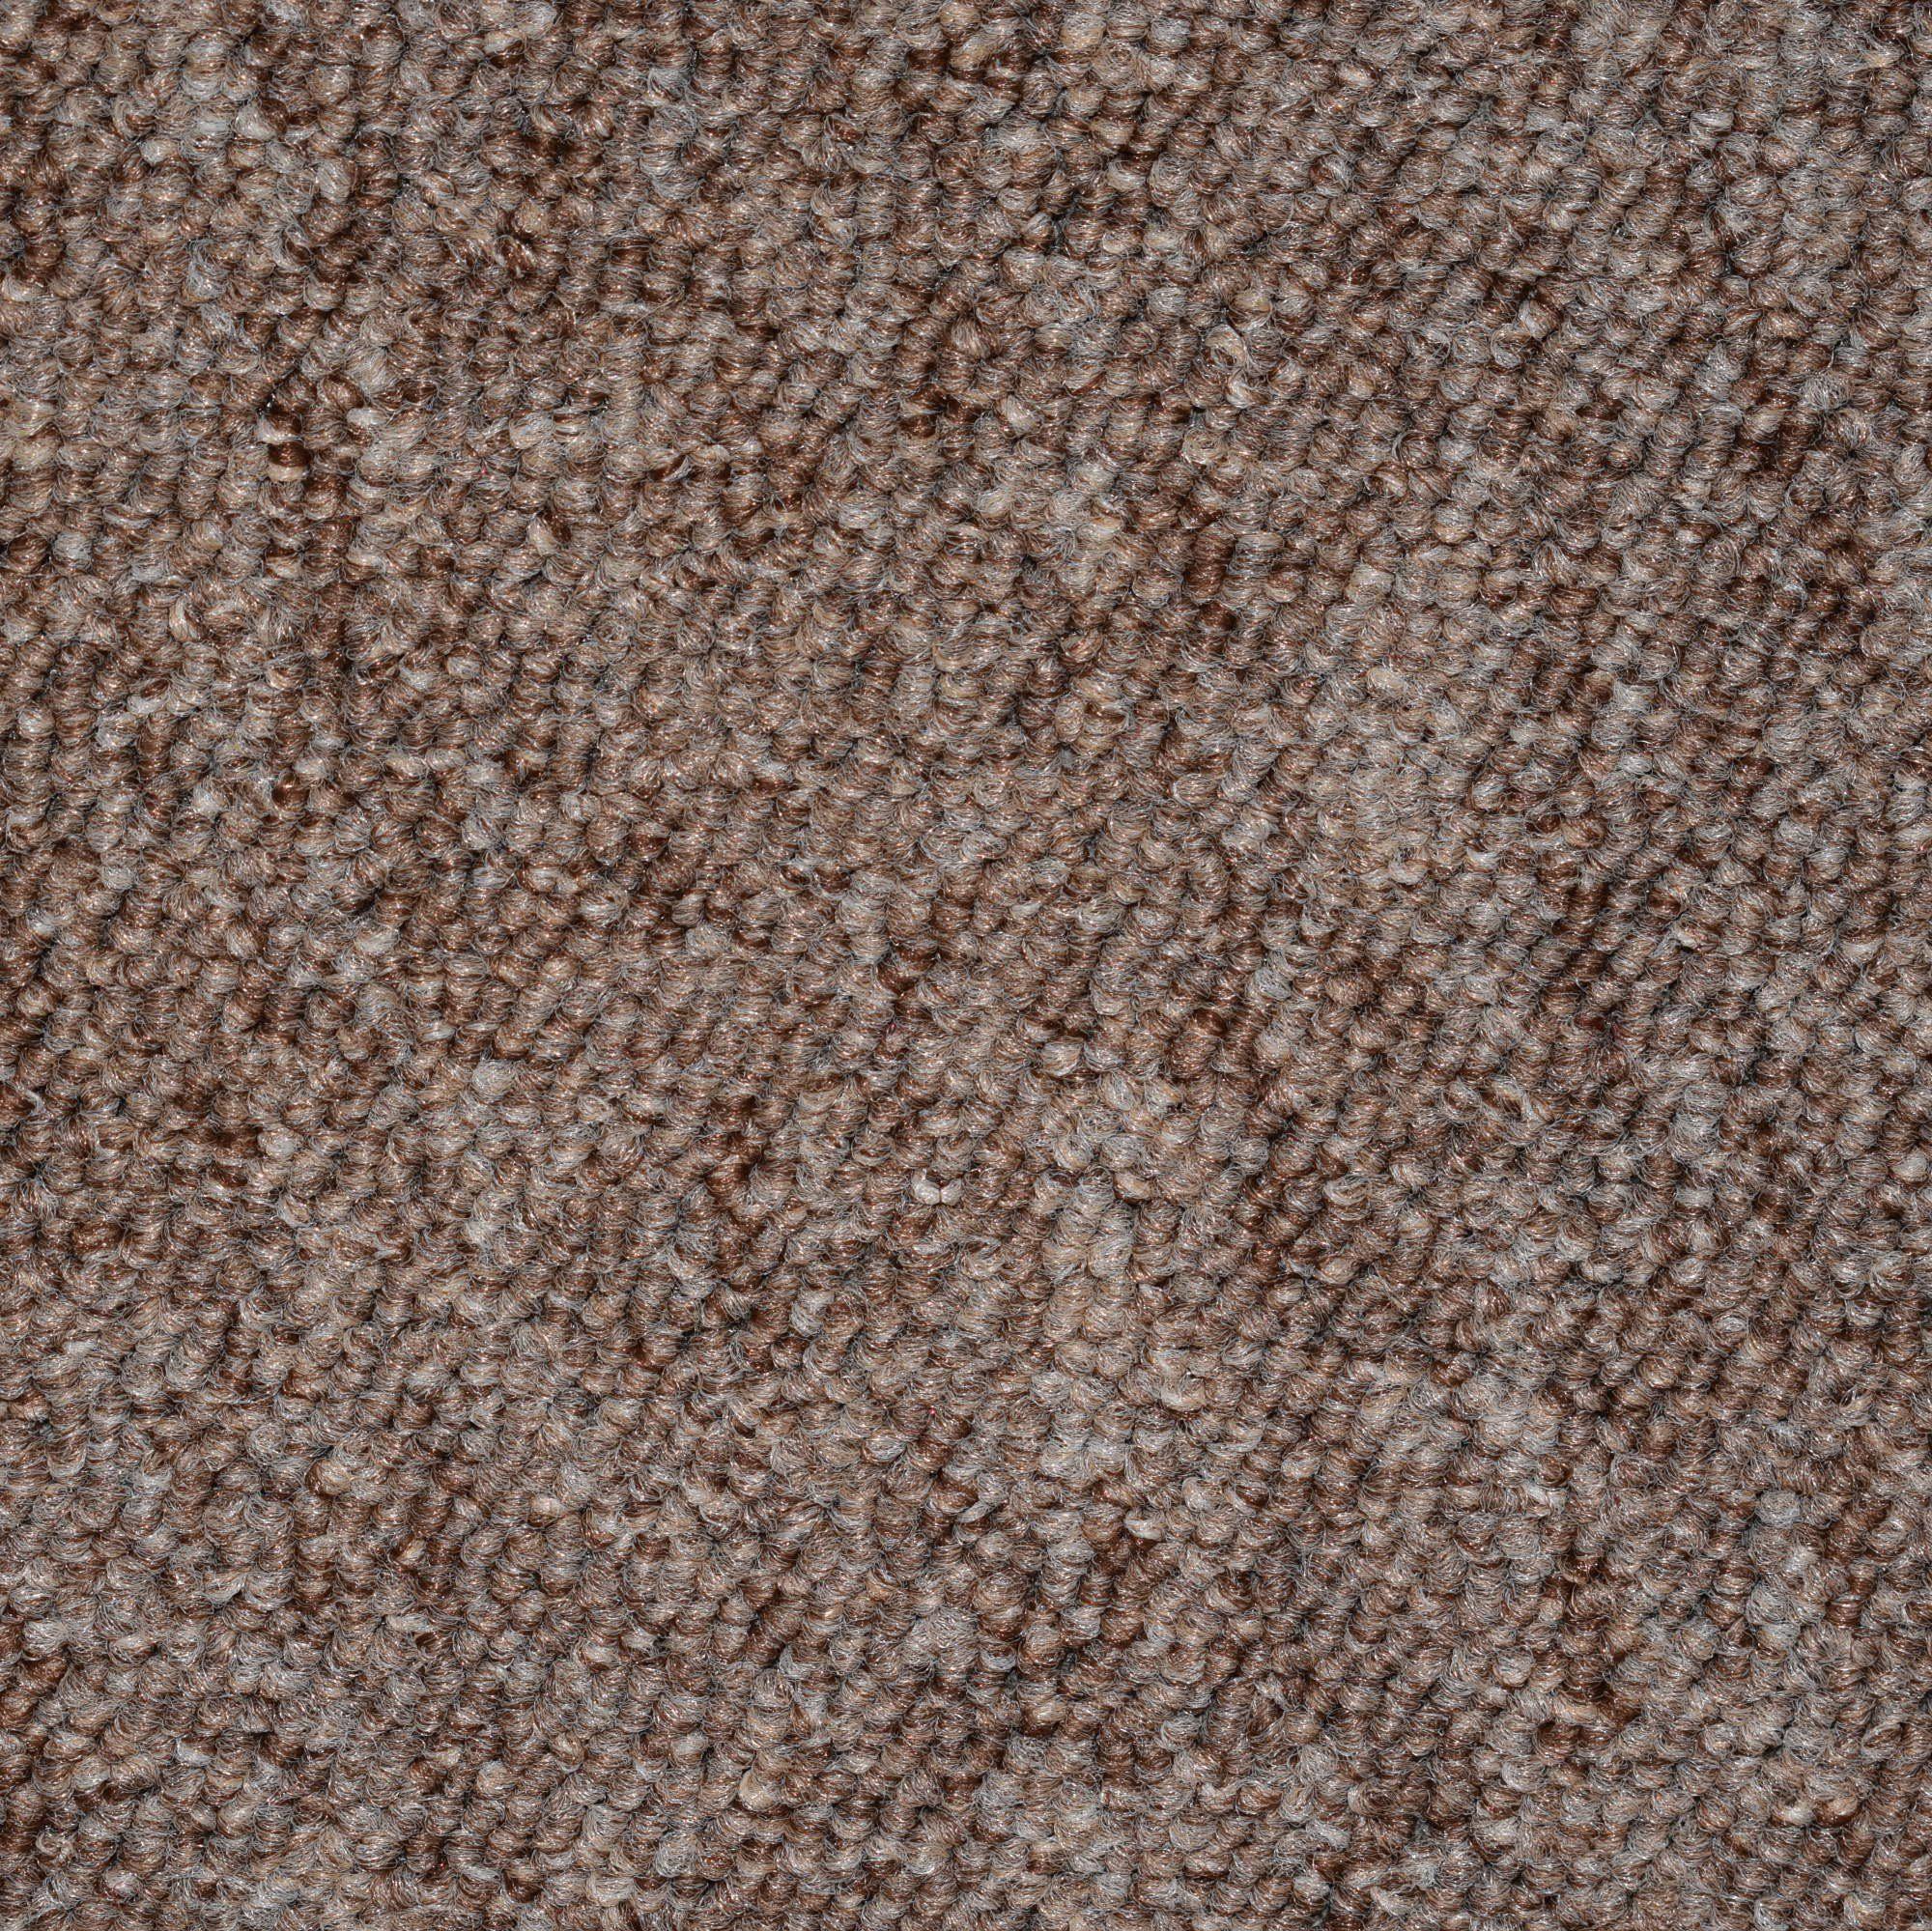 Teppichfliese »Neapel sand«, 20 Stück (5 m²), selbstliegend